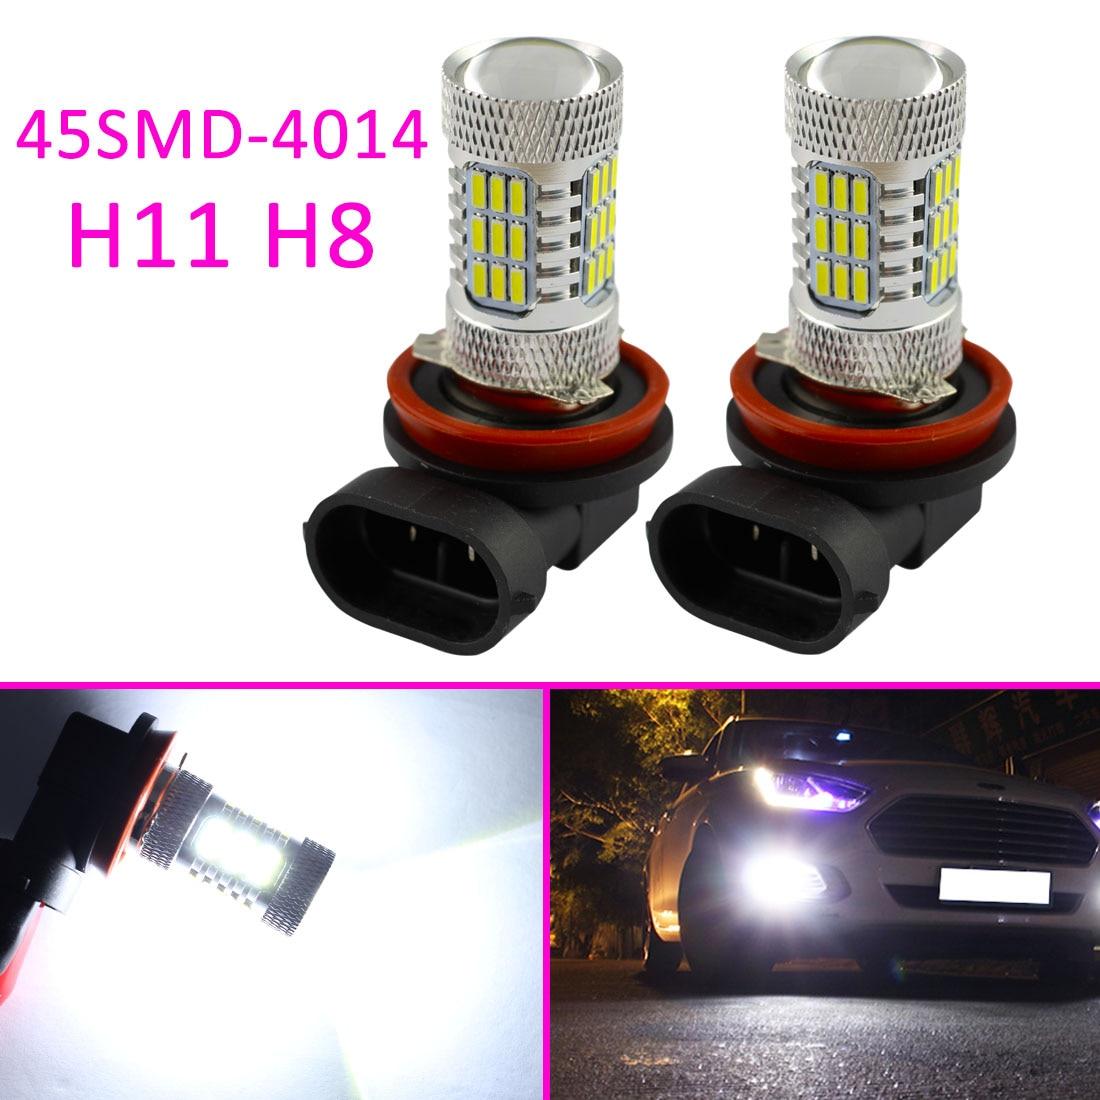 Auto Fog Light Bulb LED H11 H8 Accessories Truck Foglight DRL Lens Projector Lamp Len Driving